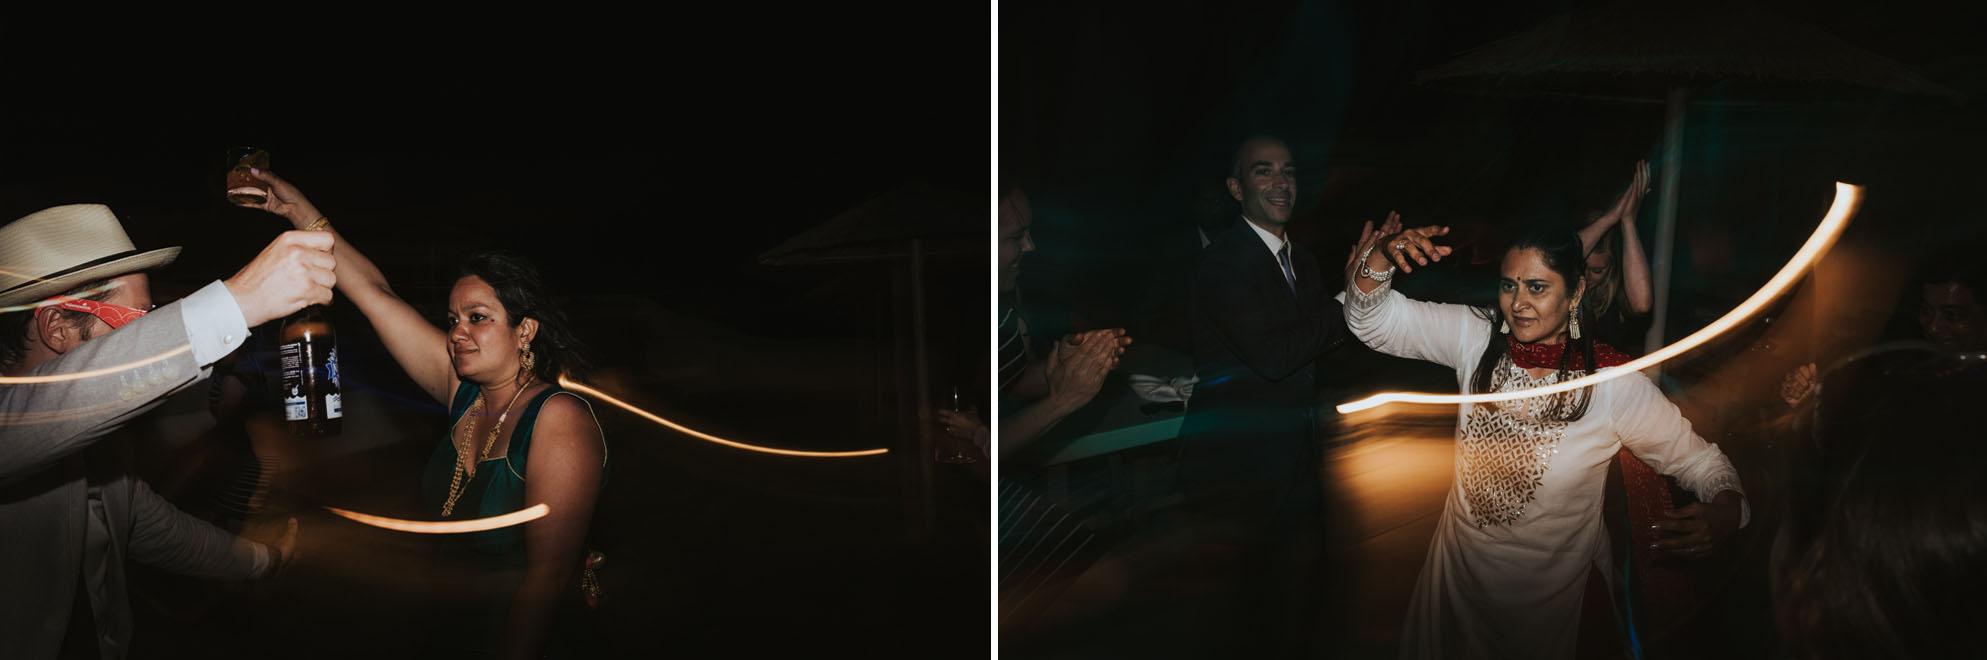 Mykonos Wedding Photographer-DMOL-6-24